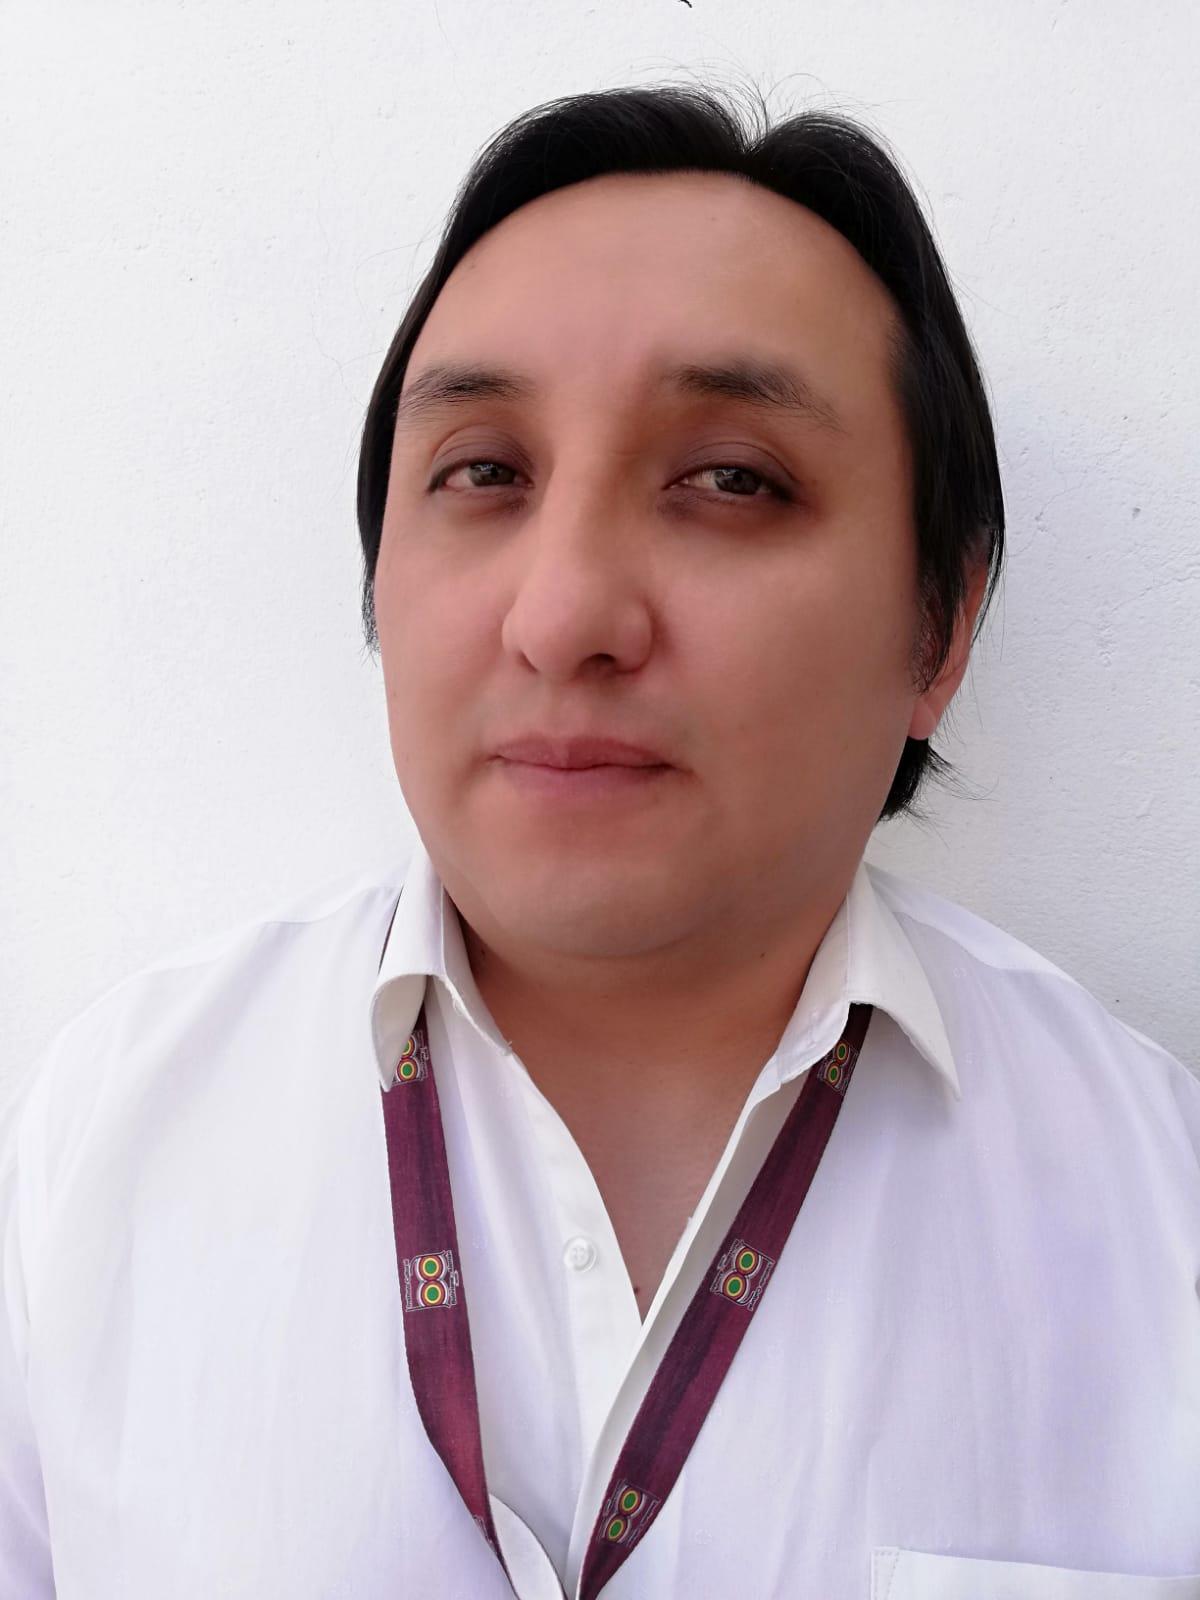 Juan Jose Maria Gutierrez Guerra